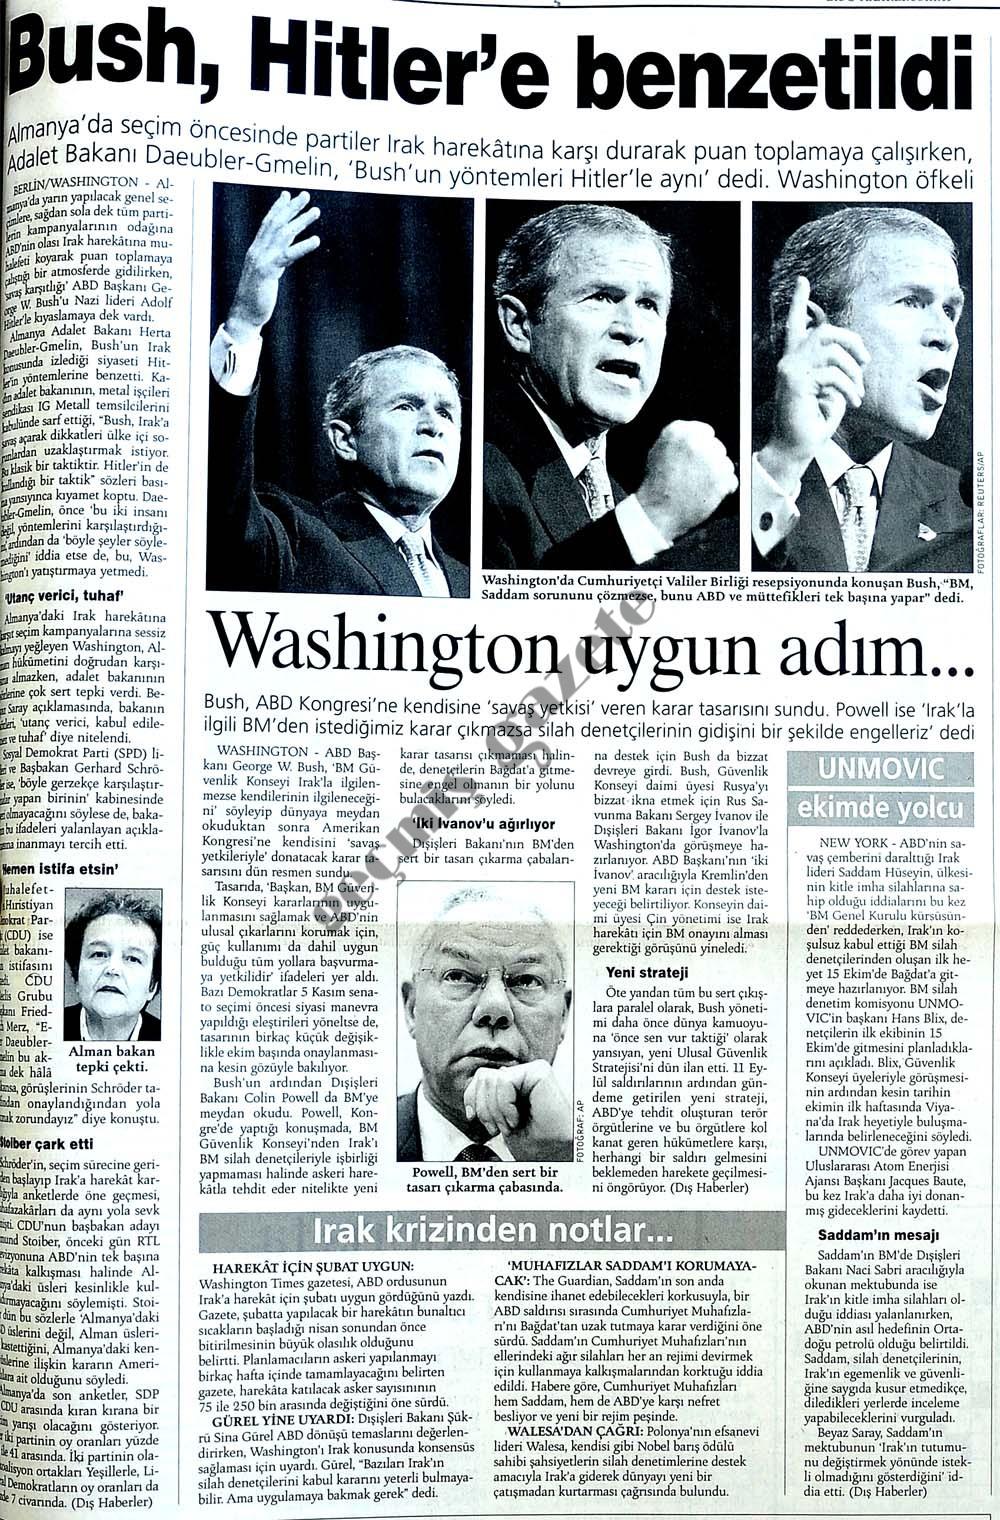 Bush, Hitler'e benzetildi